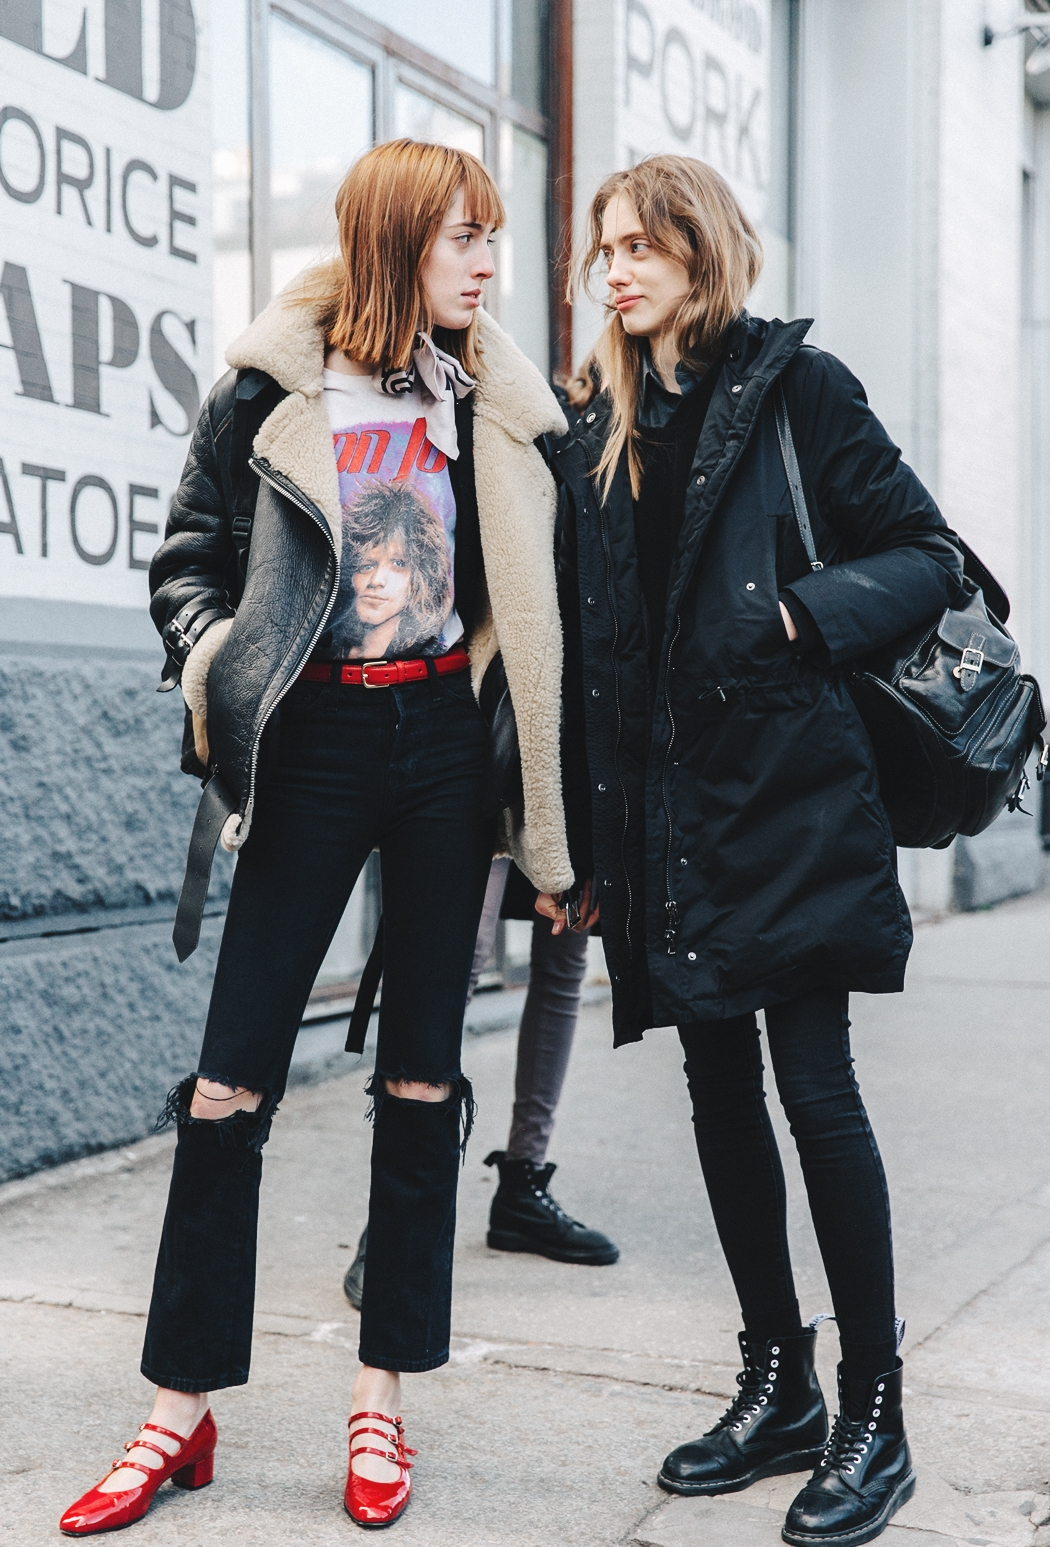 NYFW-New_York_Fashion_Week-Fall_Winter-17-Street_Style-Aviator_Jacket-Shearling_Coat-2.jpg